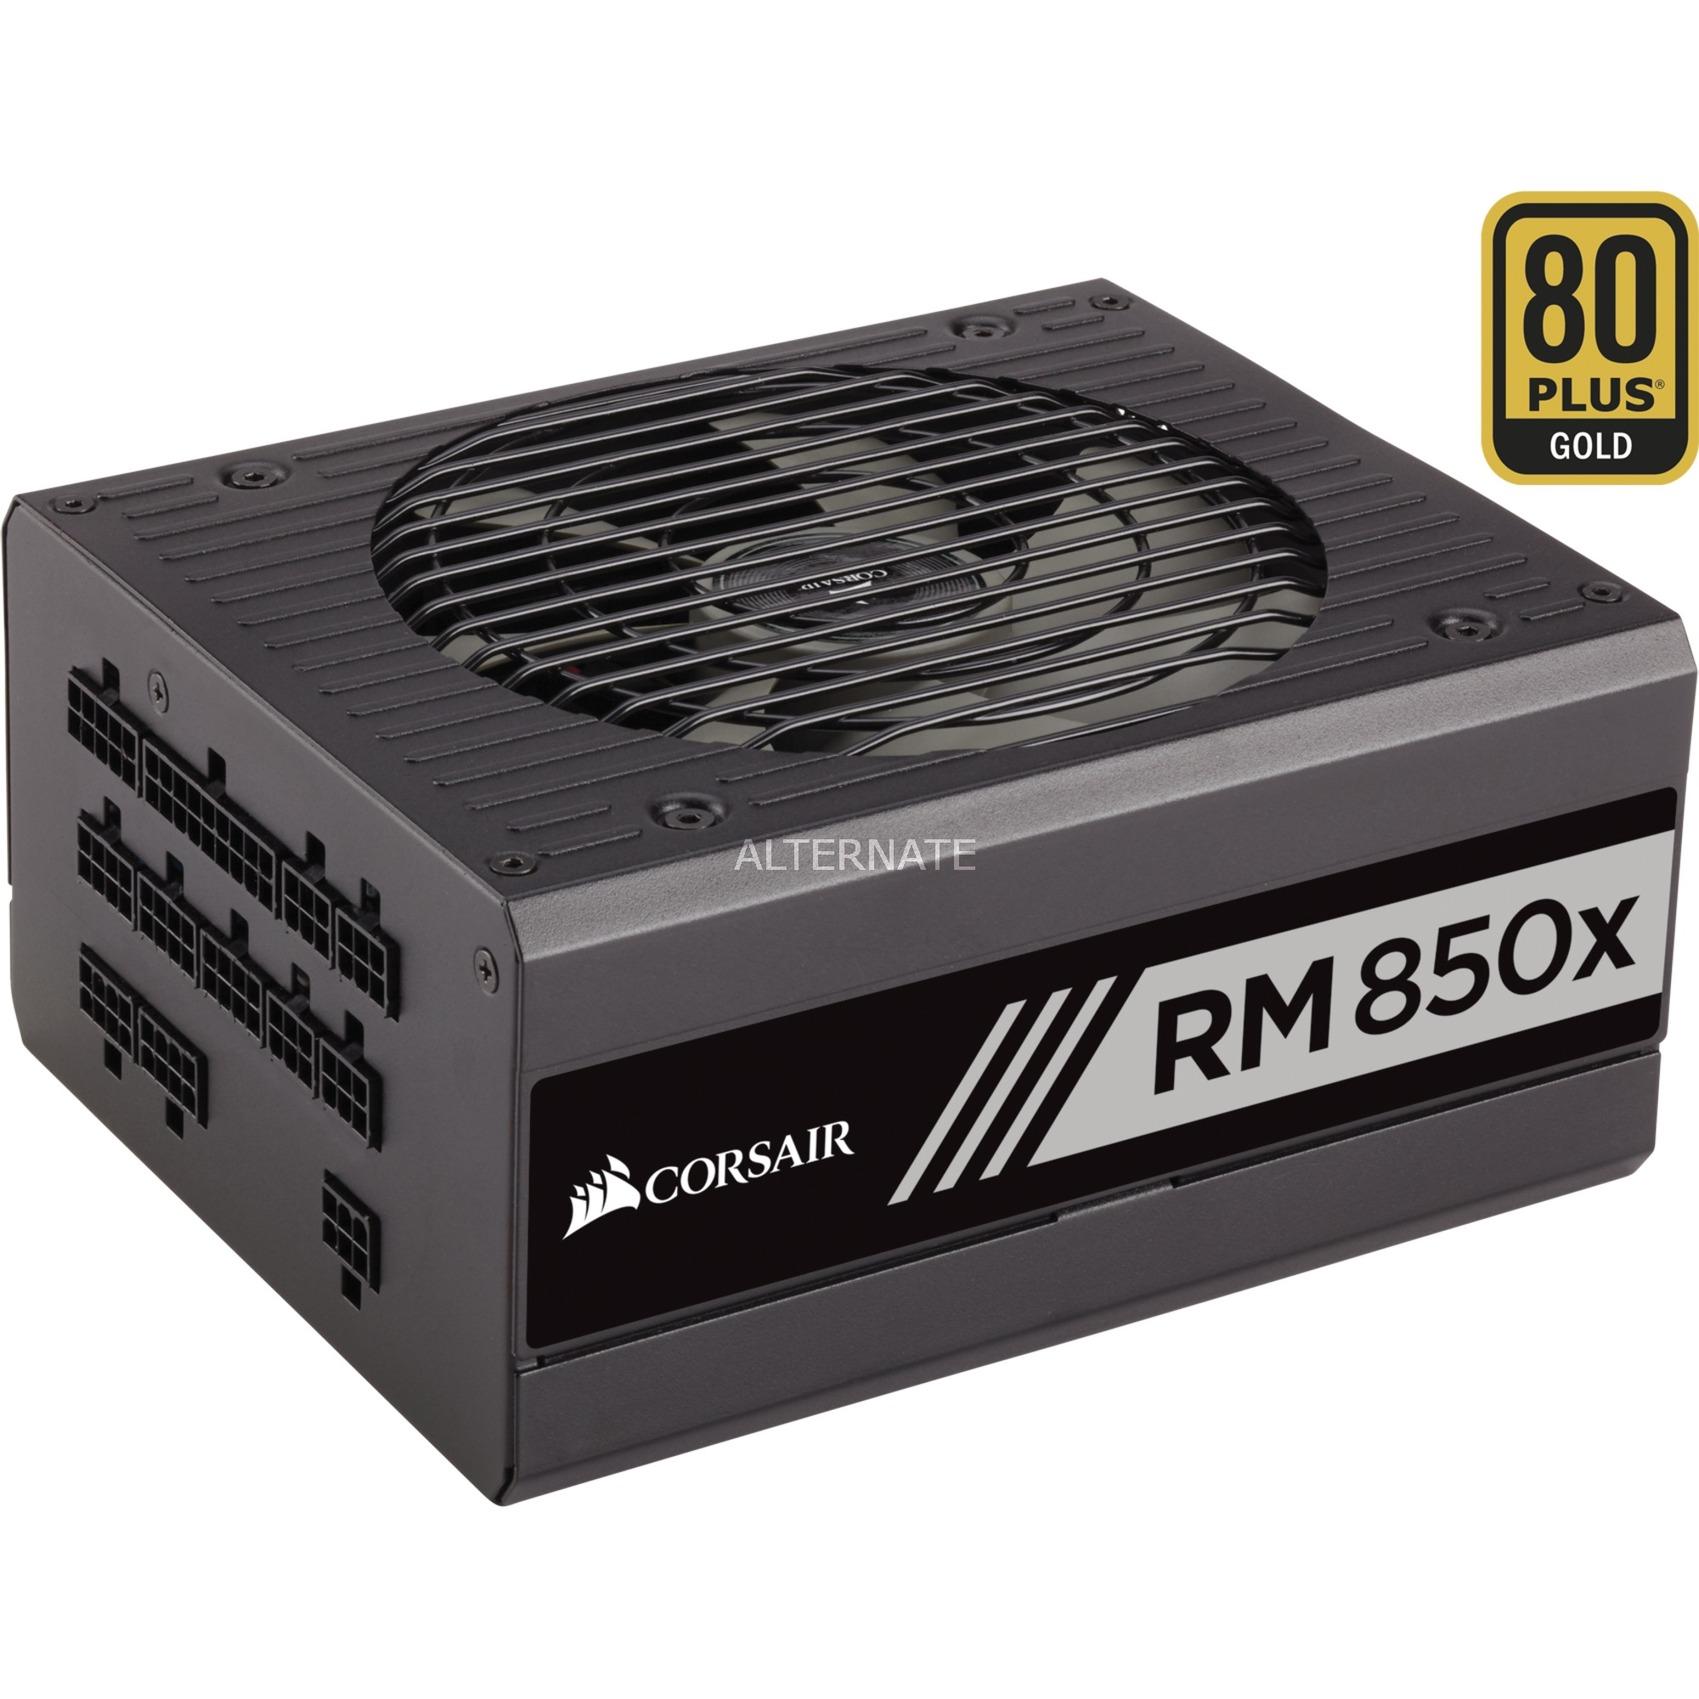 RM850X, Alimentation PC